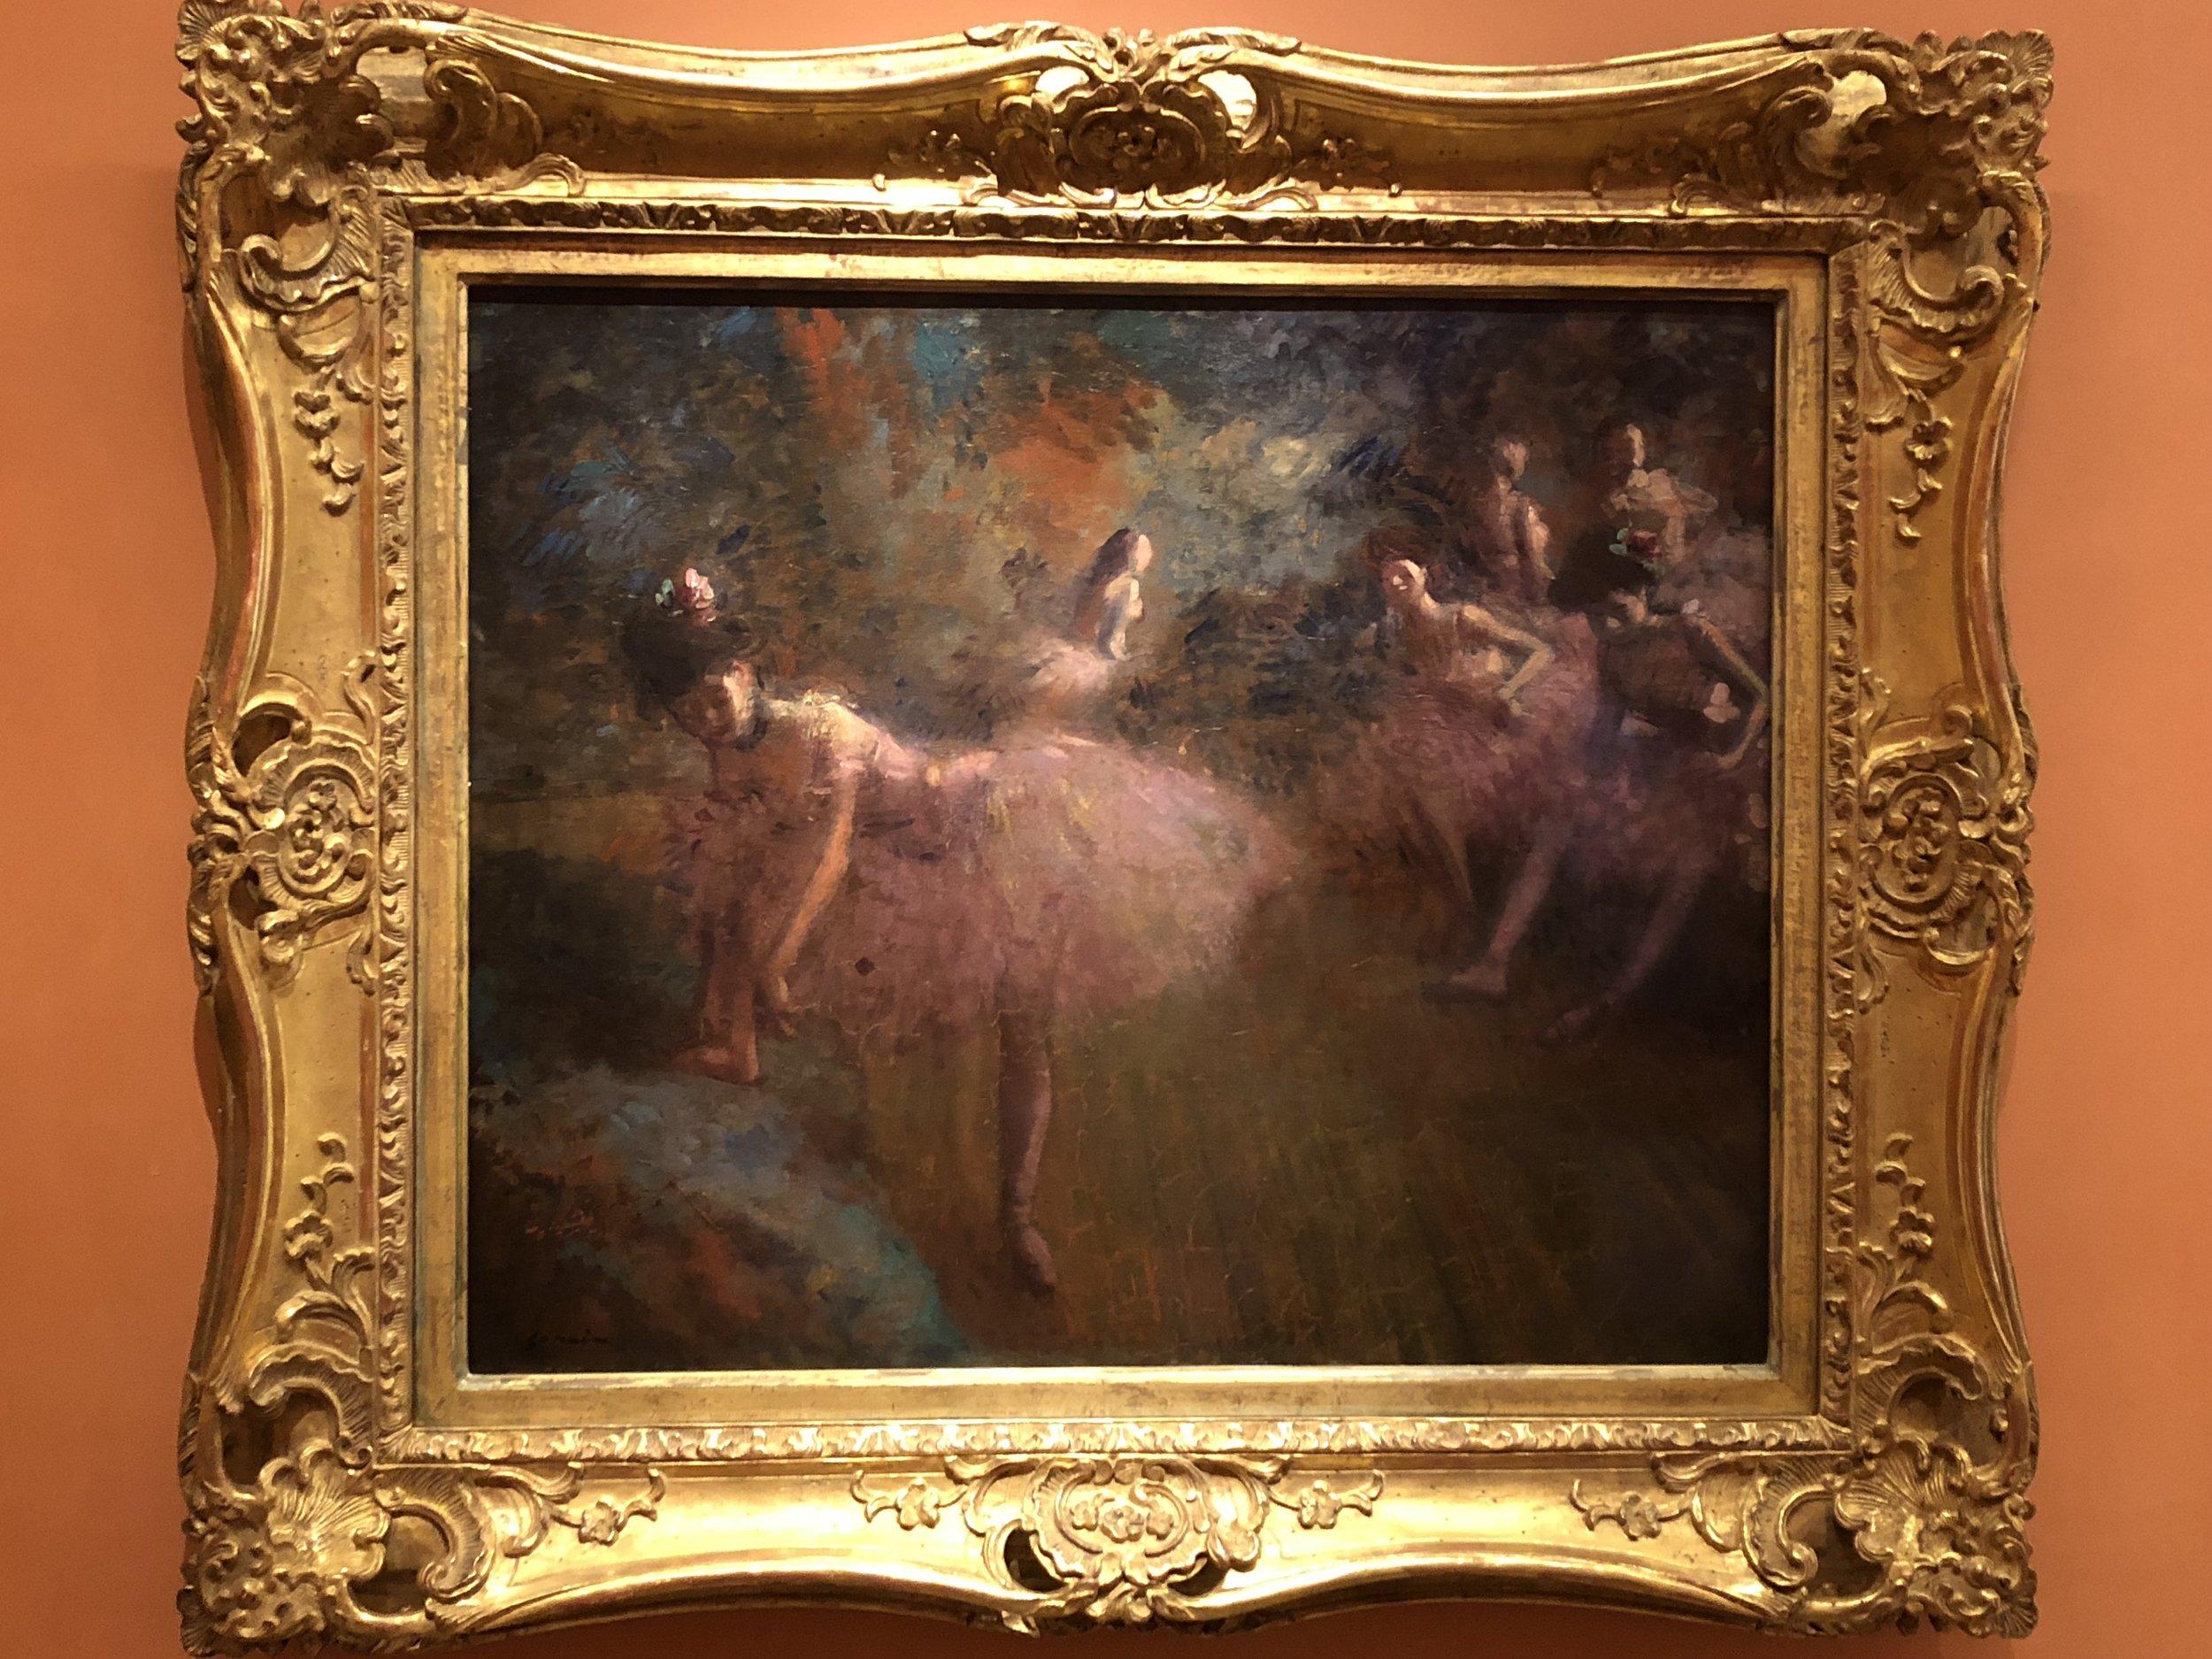 Jean Louis Forain  Dancers in Pink, 1905